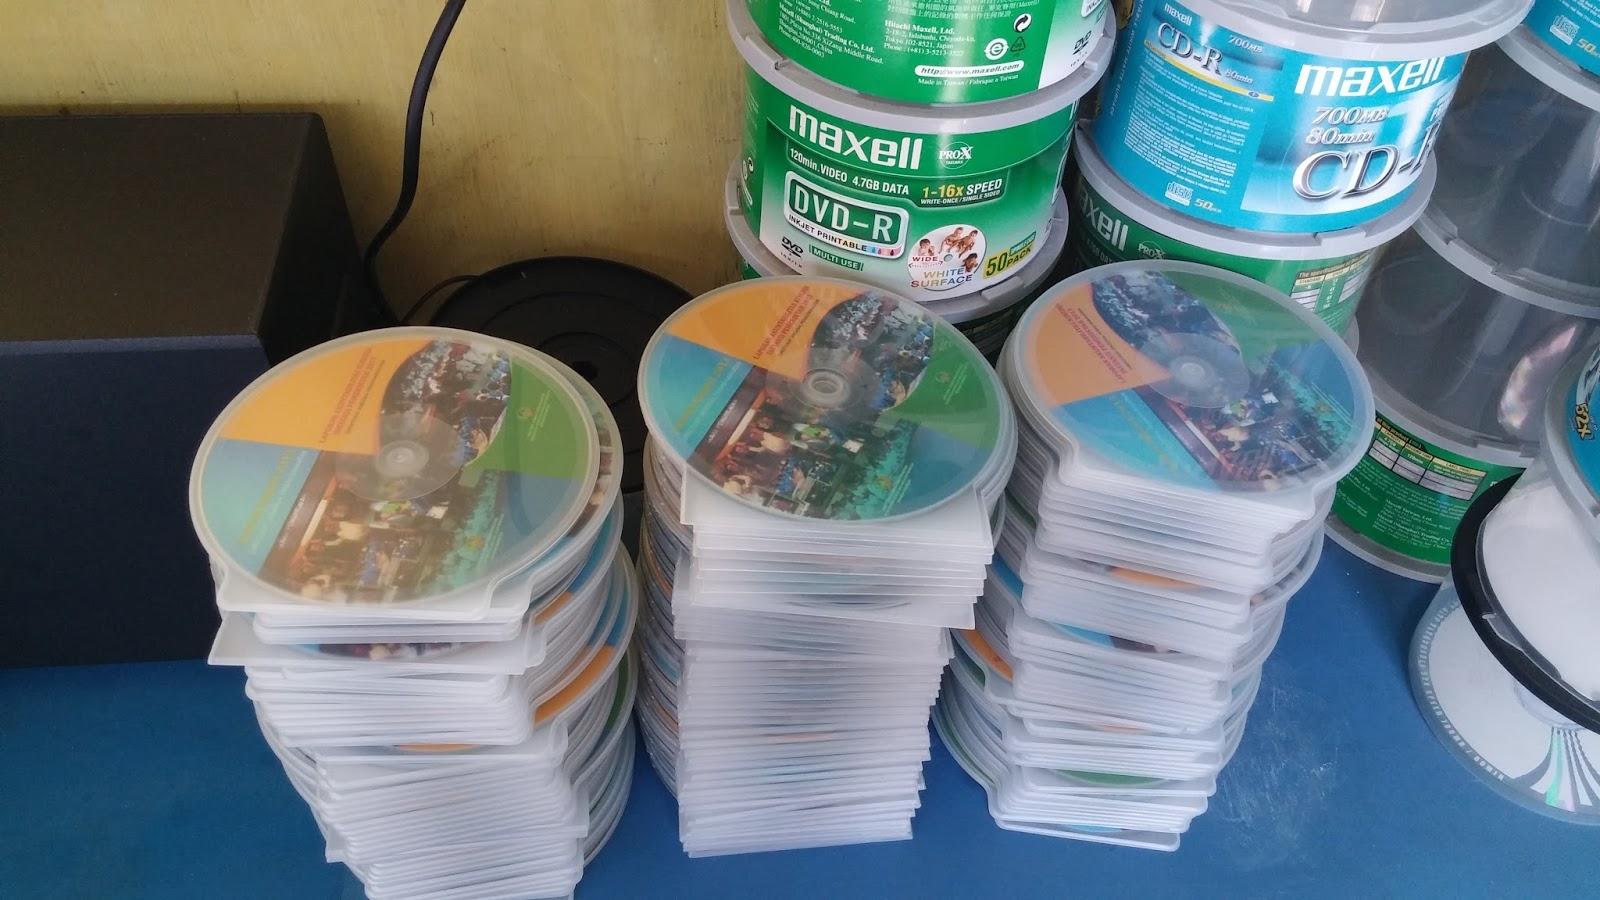 Jasa Cetak Dvd di DKI Jakarta Kota Jakarta Timur Makasar Pinang Ranti